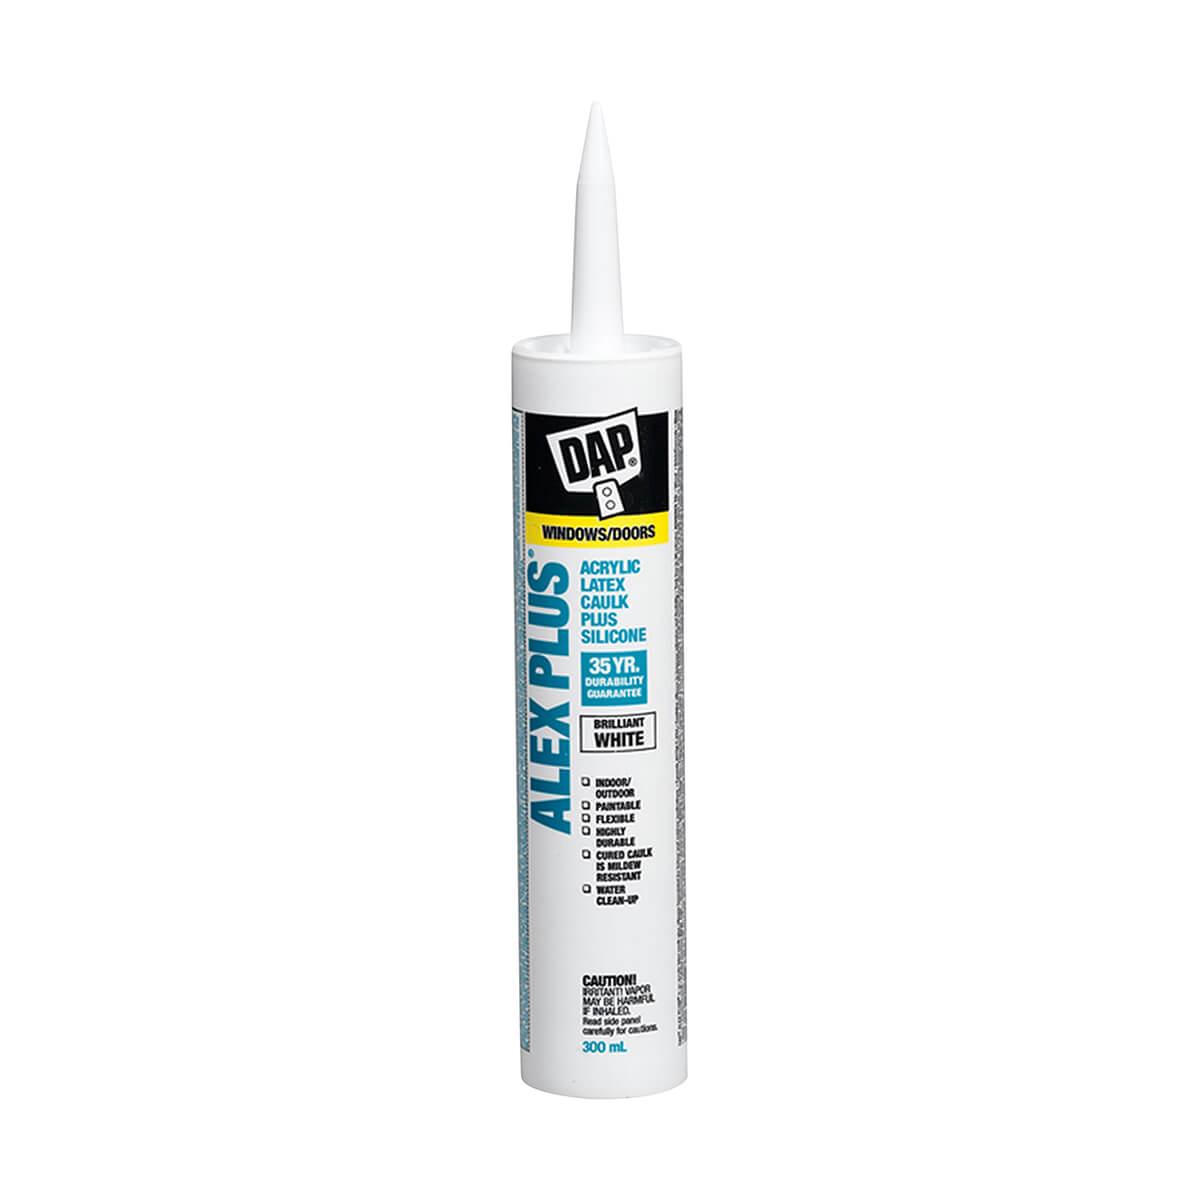 Dap Alex Plus Clear Acrylic Latex Caulk Plus Silicone - Clear - 300ml